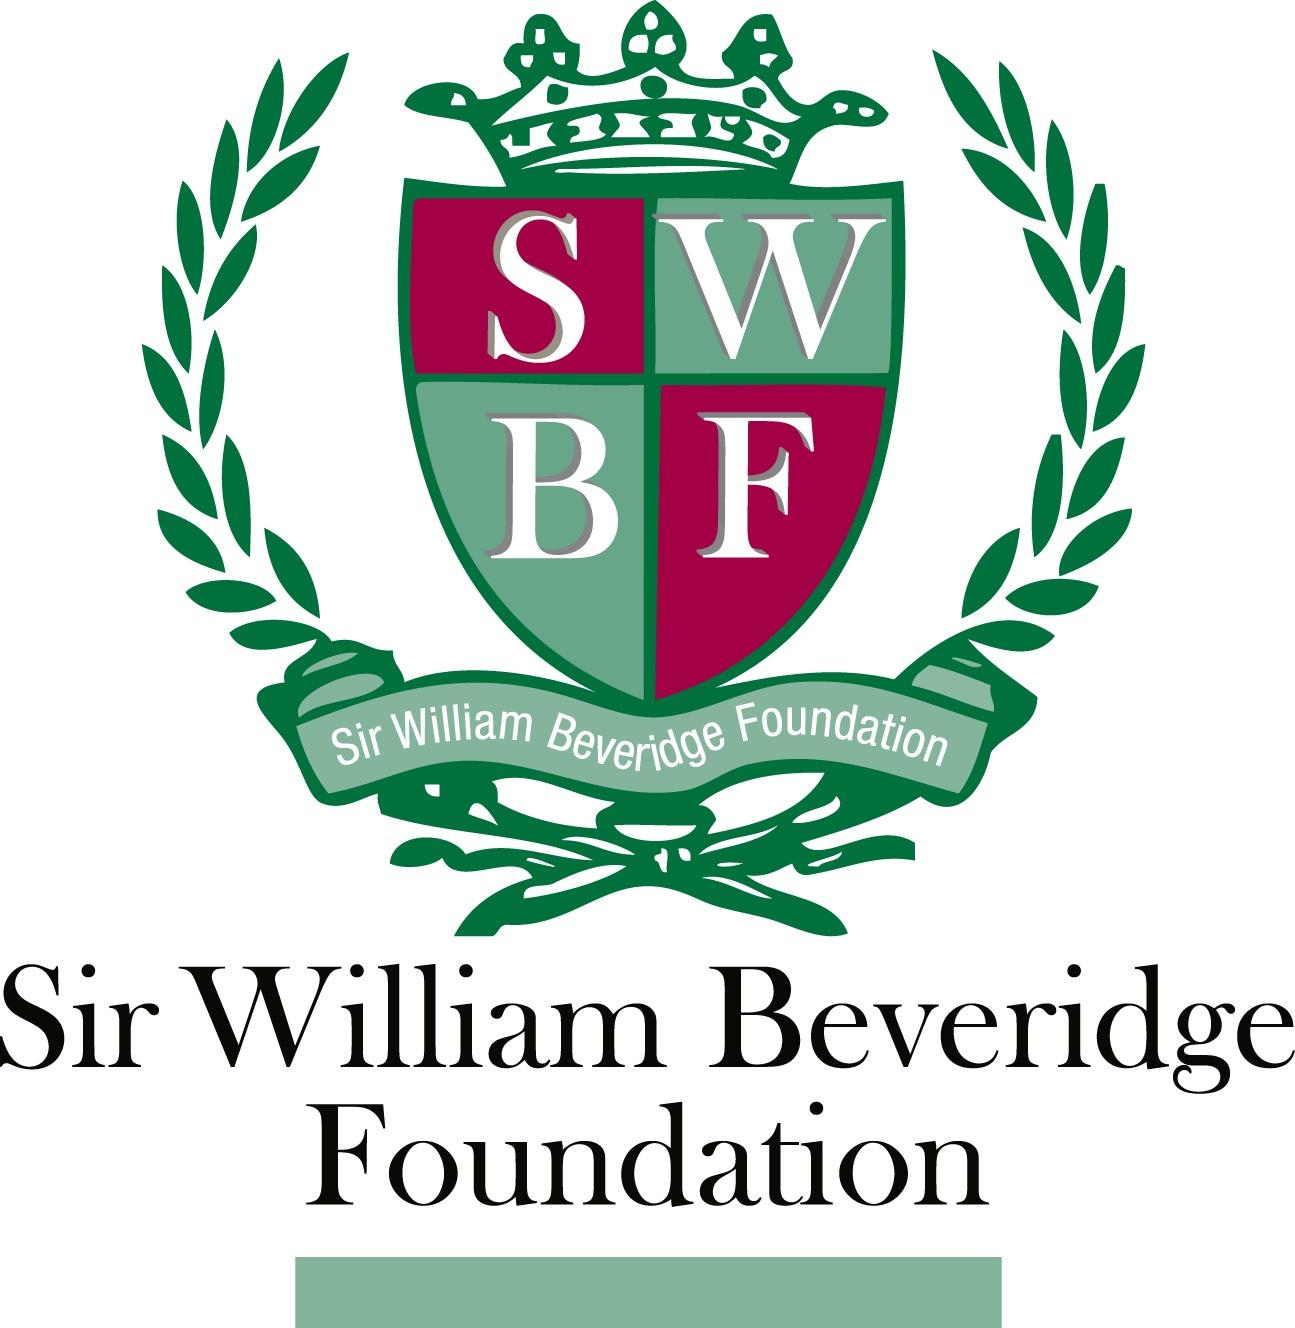 Beveridge Foundation